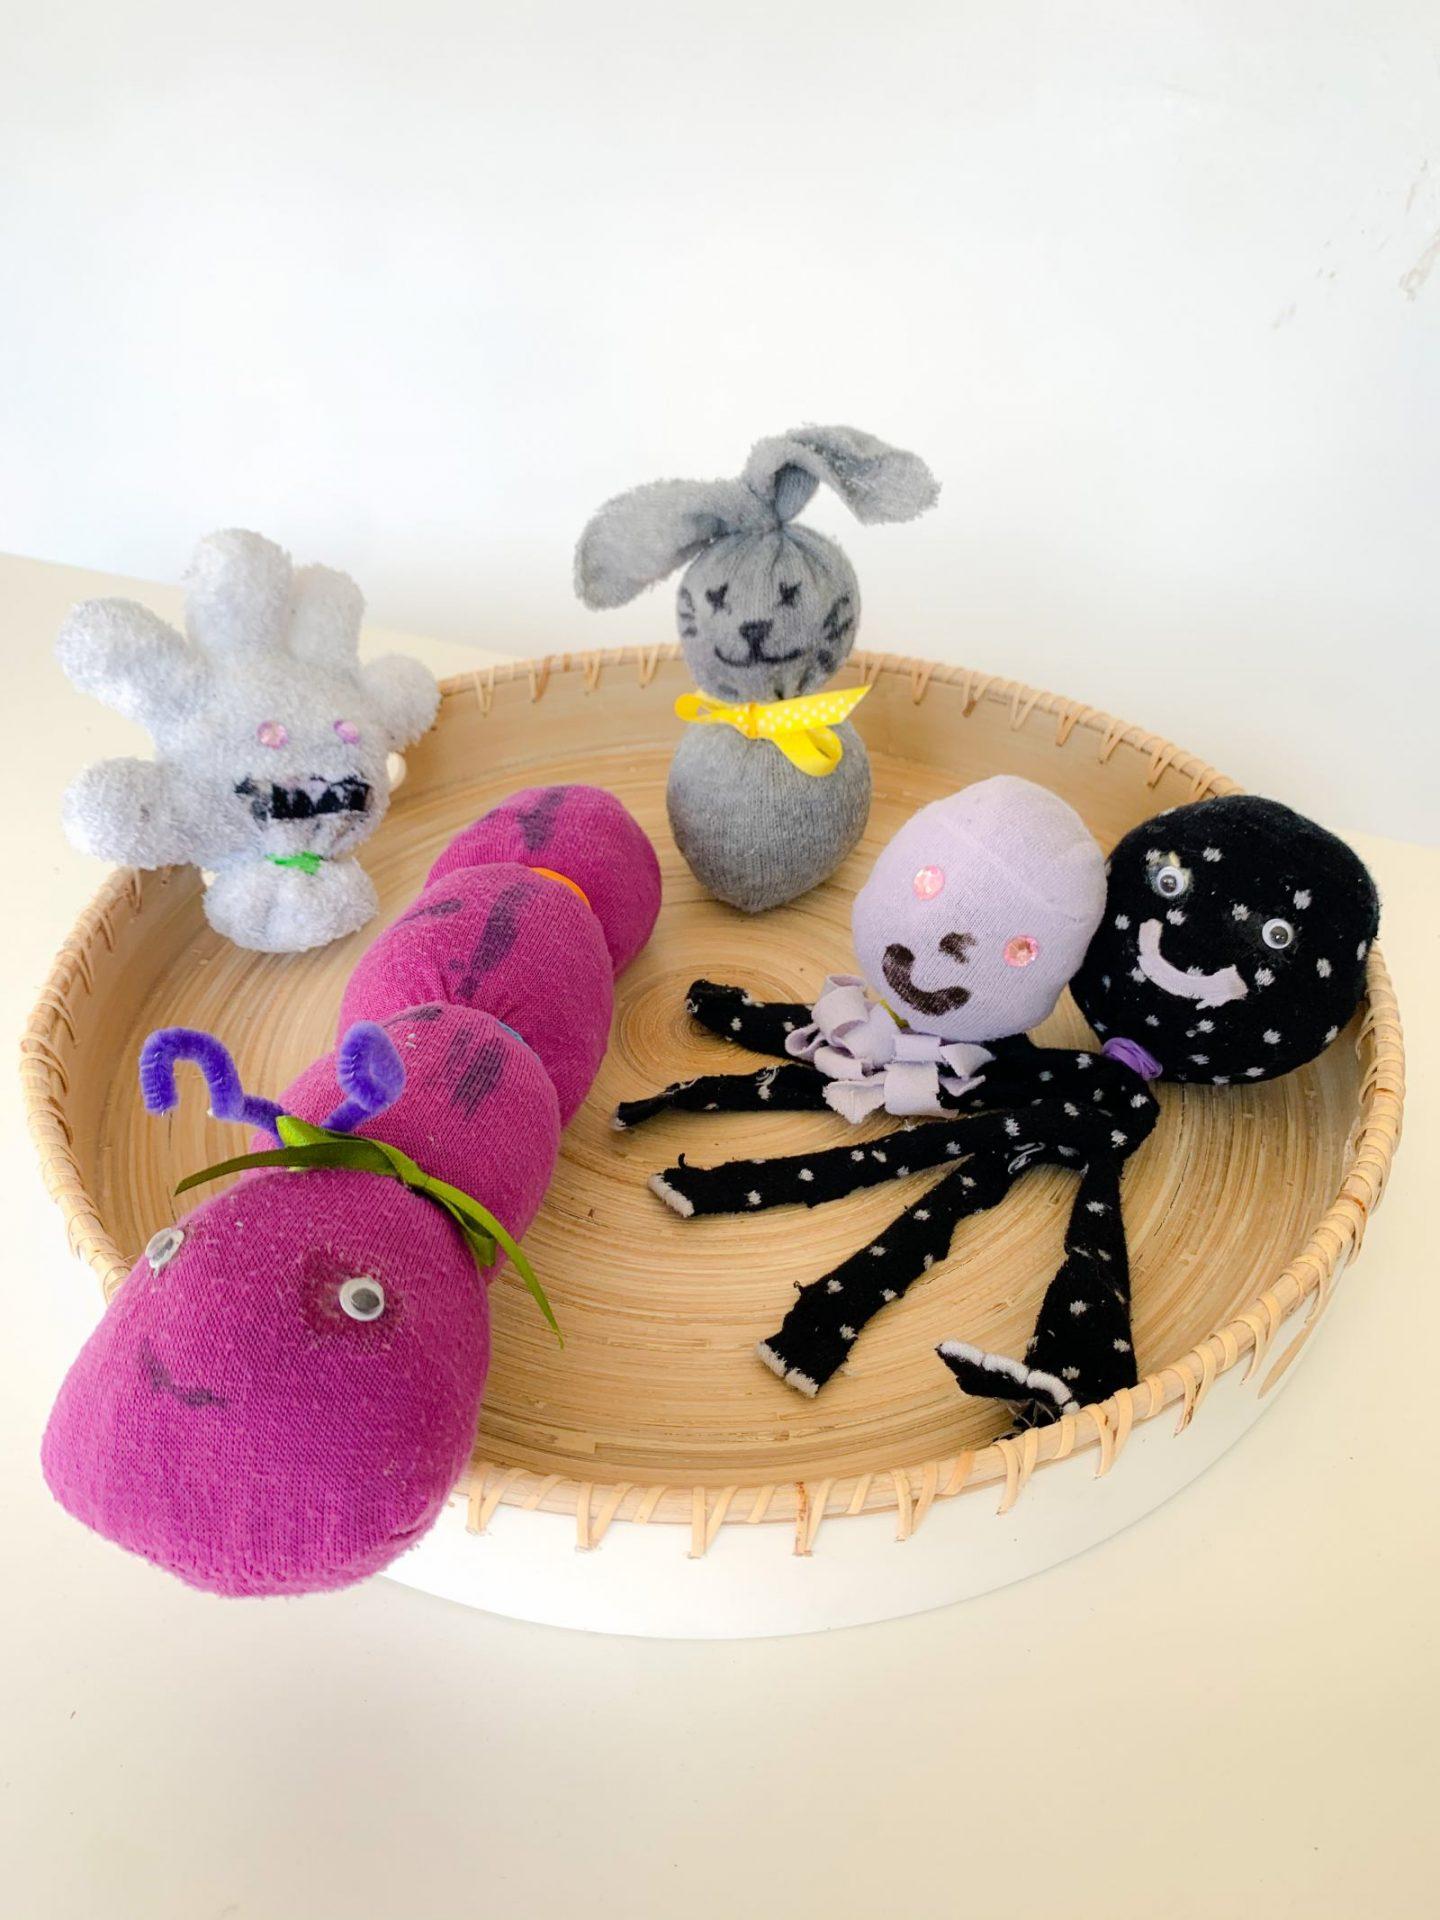 DIY NO SEW SOCK ANIMALS KIDS' CRAFT